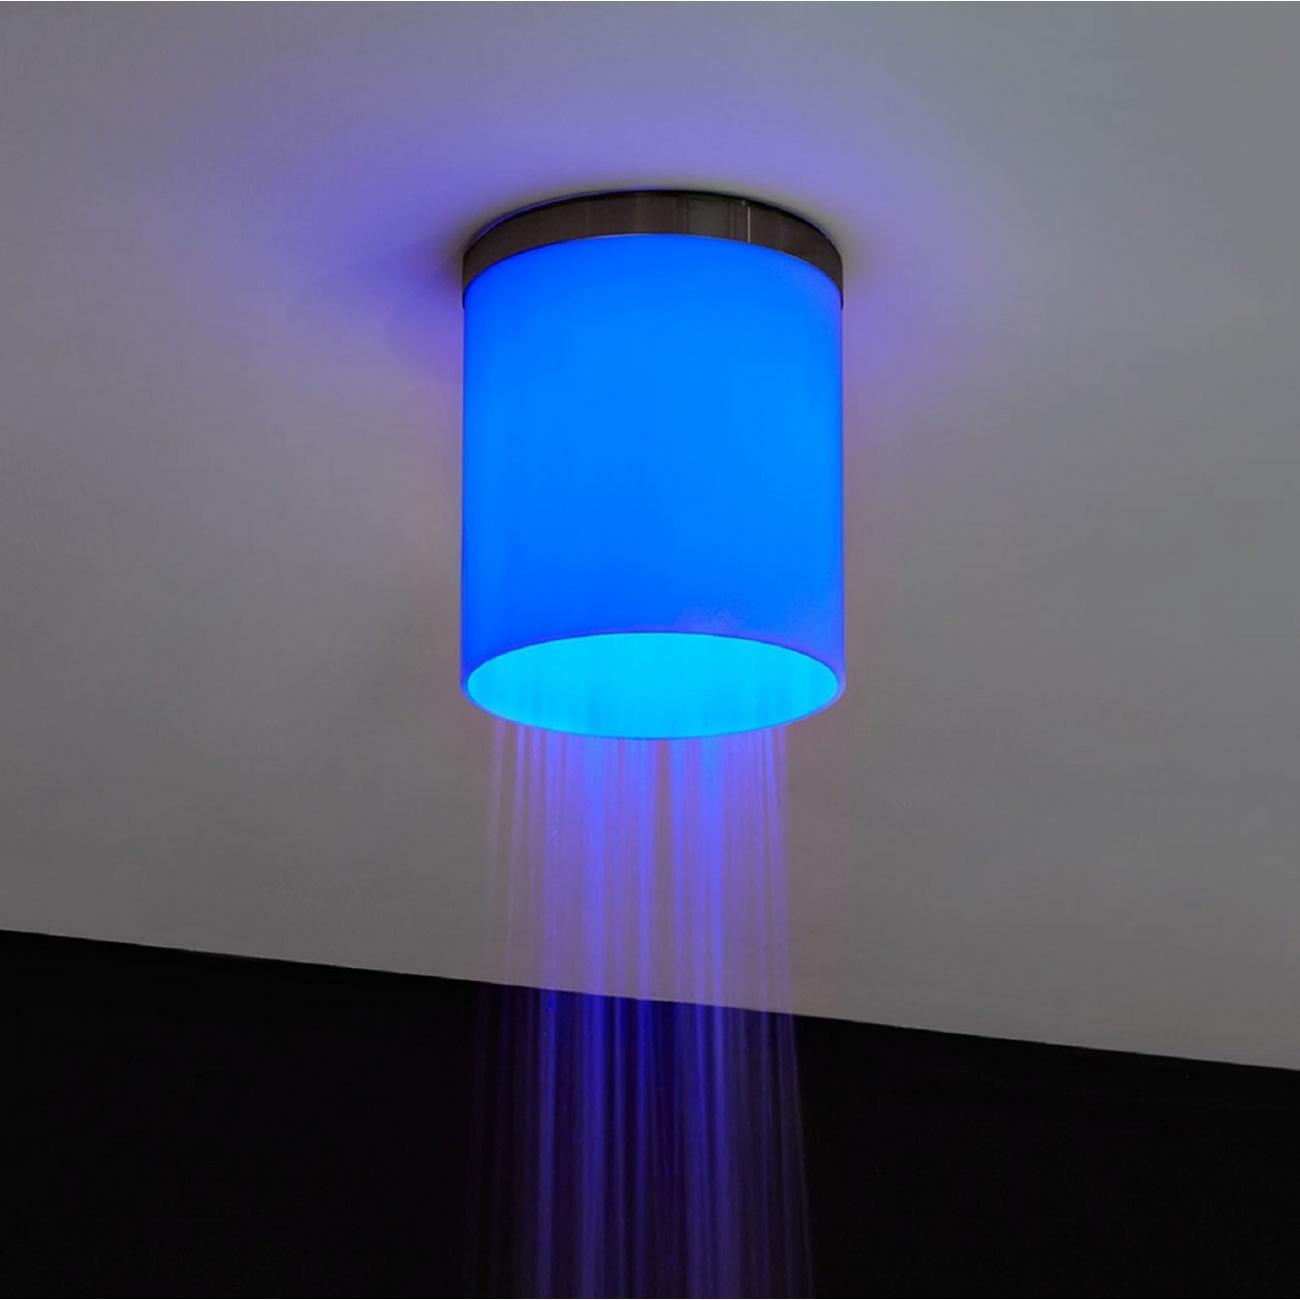 ANTONIO LUPI IRIDE CEILING MOUNTED SHOWERHEAD LED